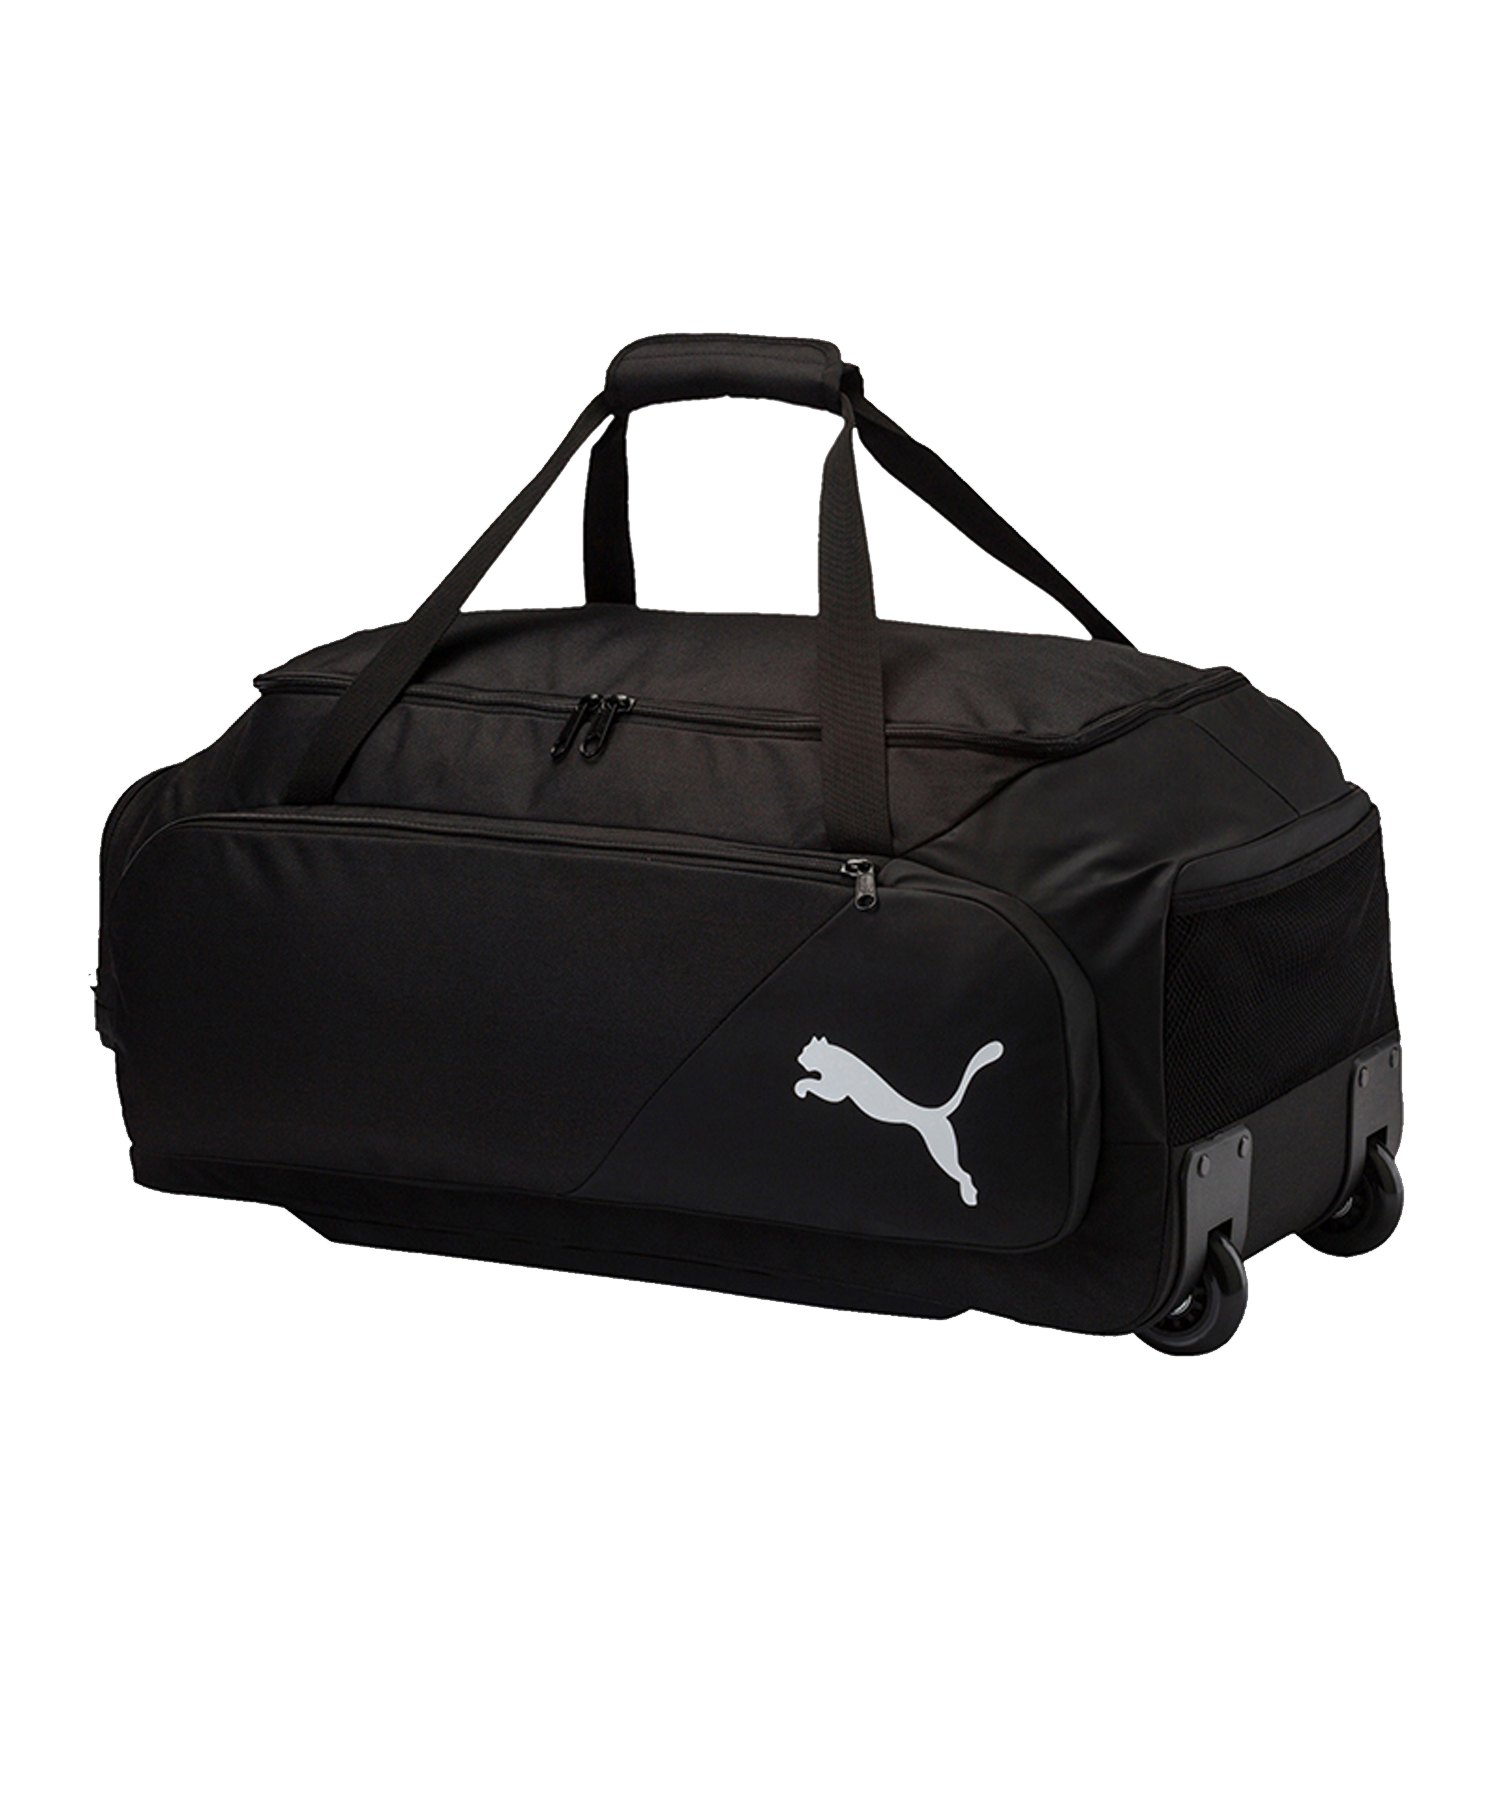 15ca9b7198e46 PUMA LIGA Medium Wheel Bag Tasche Schwarz F01 - schwarz